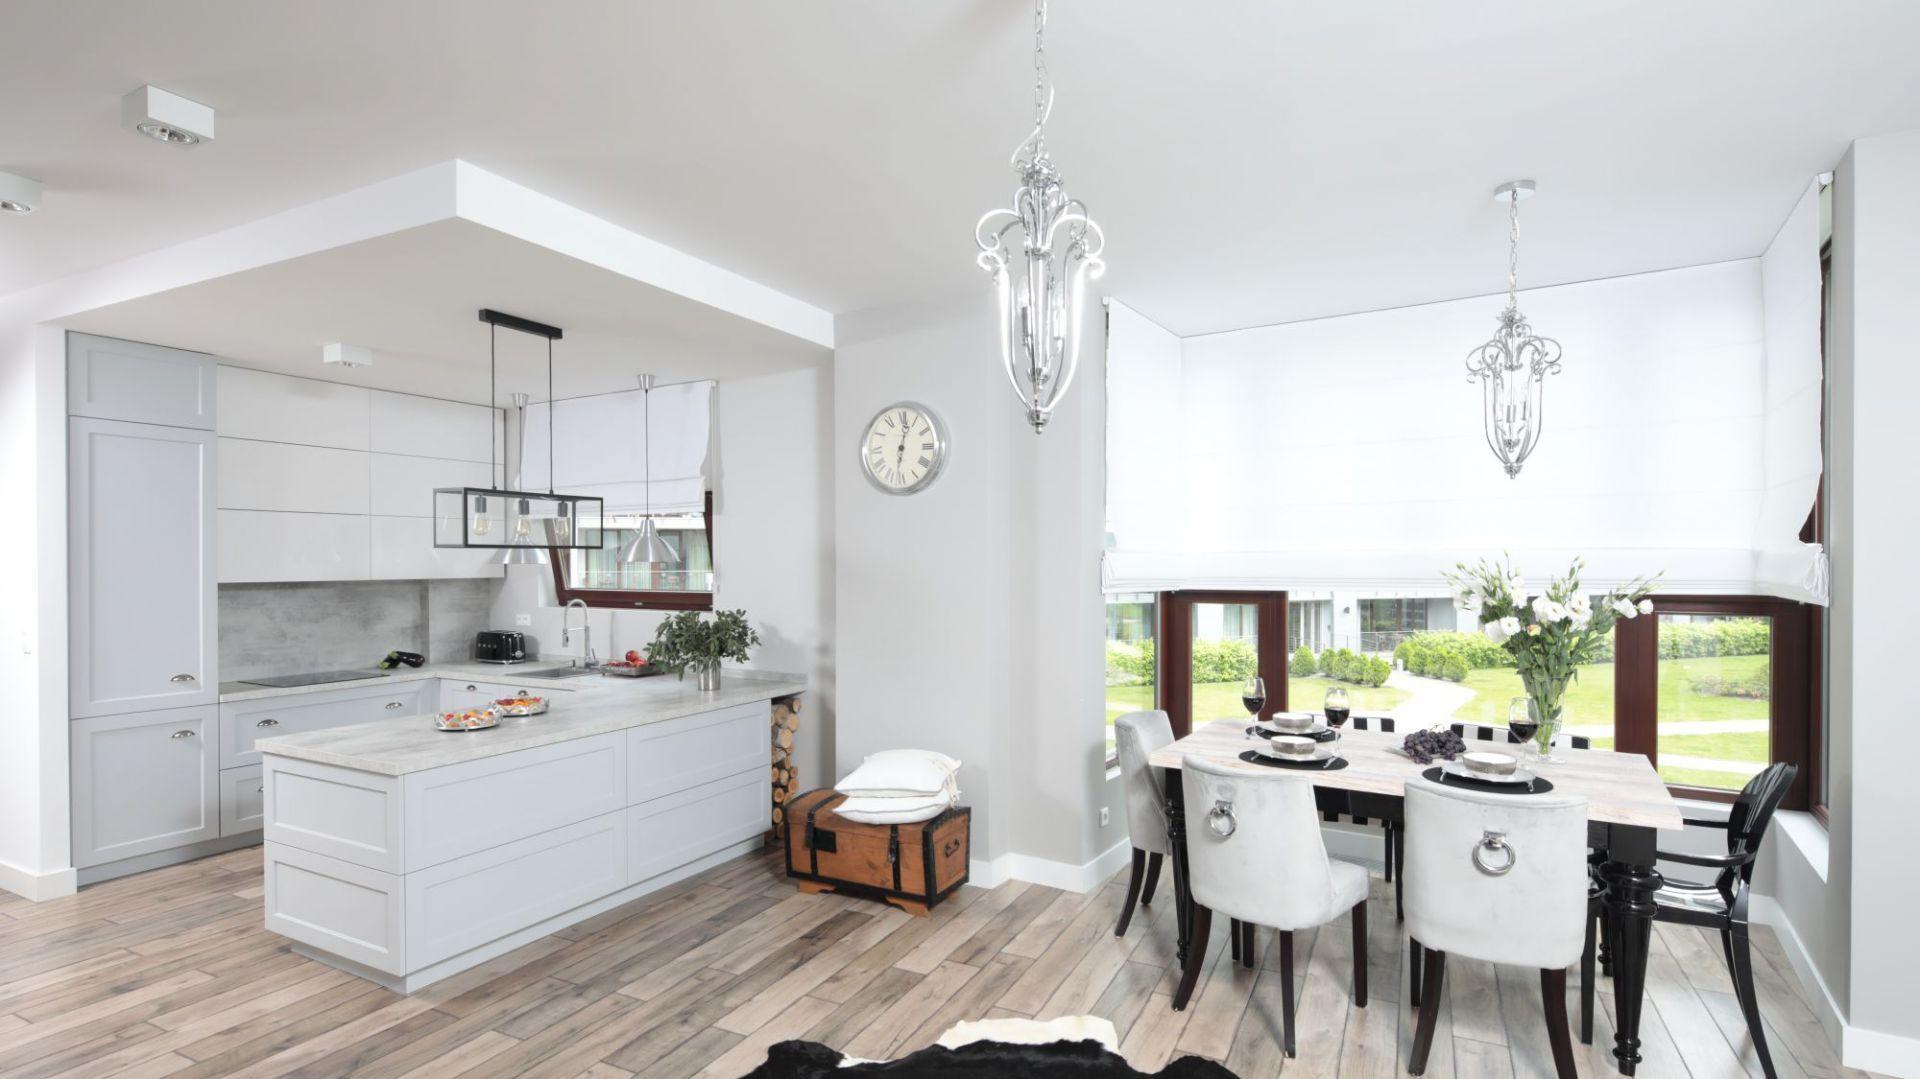 Salon Z Kuchnia I Jadalnia 20 Pieknych Wnetrz Kitchen Design Home Decor Kitchen Styling